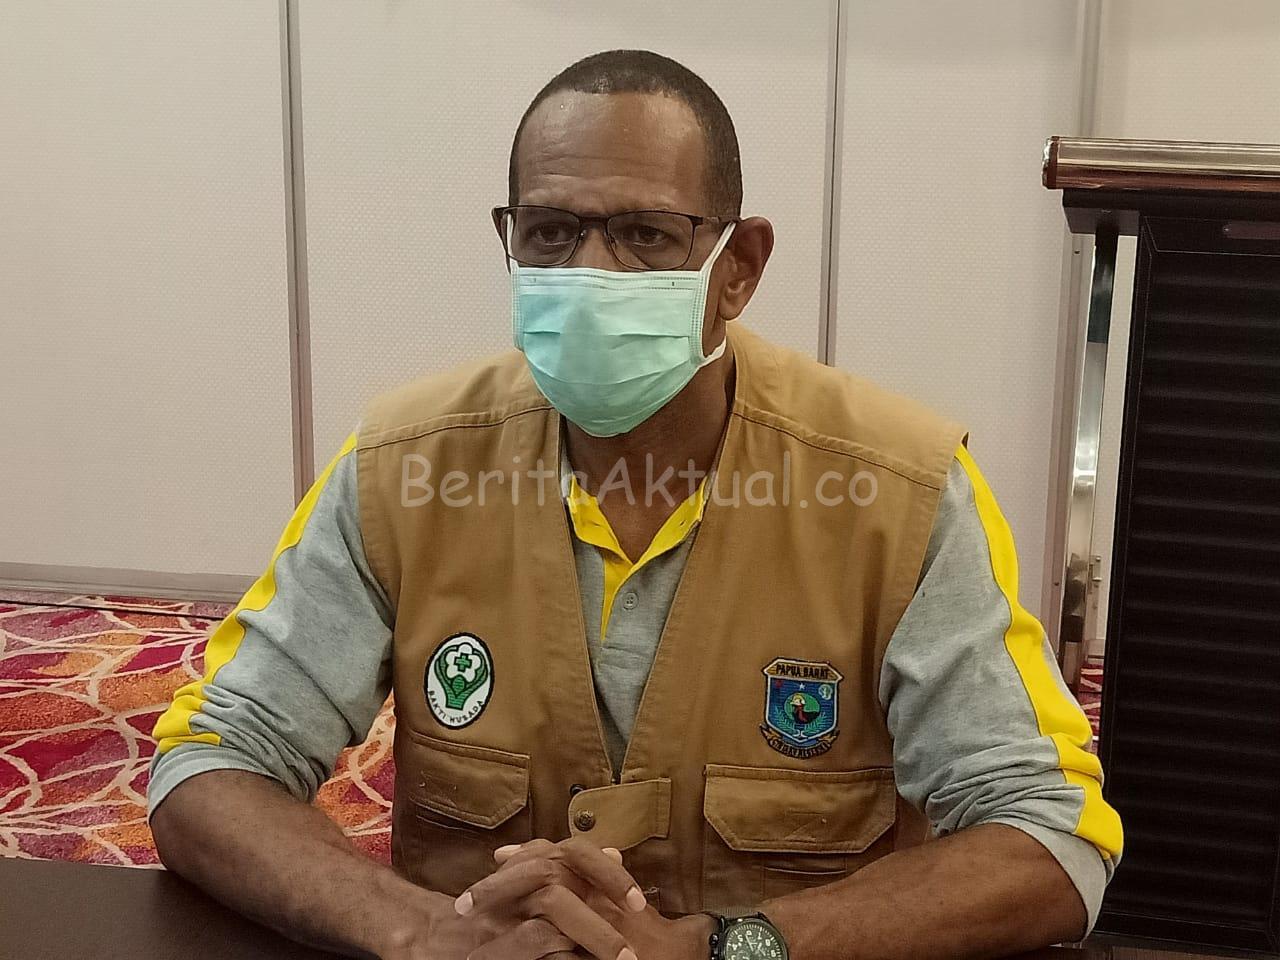 2 Warga Manokwari Terkonfirmasi Positif Covid-19 1 IMG 20200416 WA0057